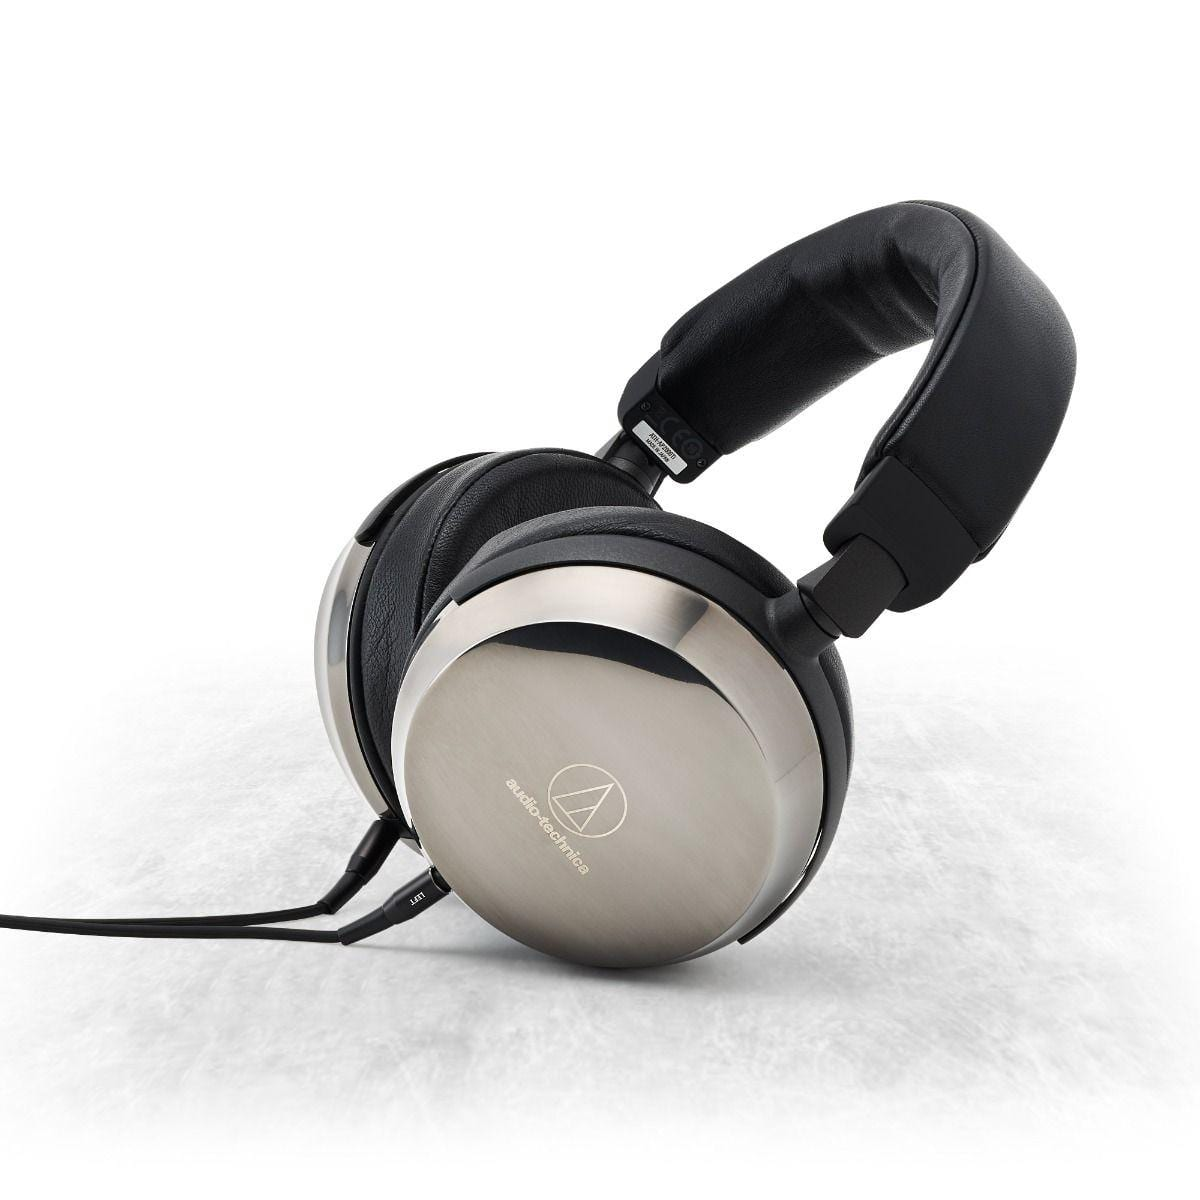 Audio-Technica выпускает титановые наушники за 100000 рублей (p ath ap2000ti 01)